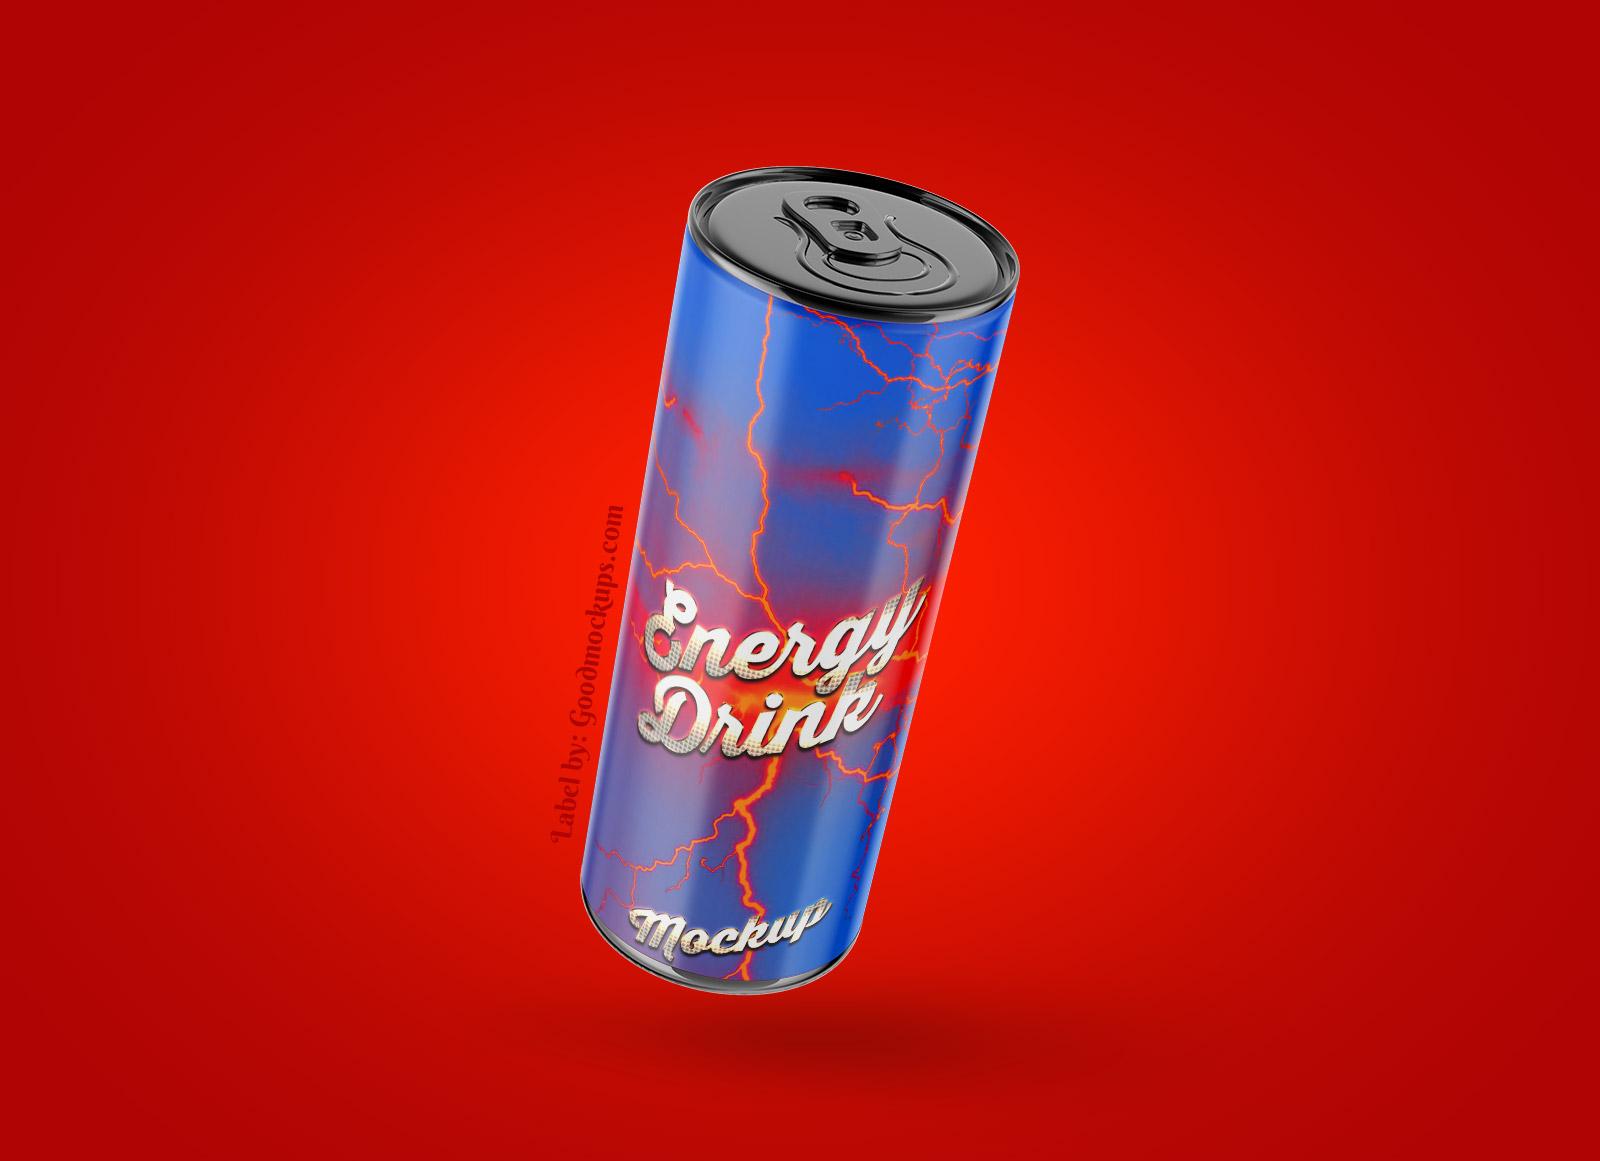 Free-Tin-Can-Energy-Drink-Mockup-PSD-Set-2